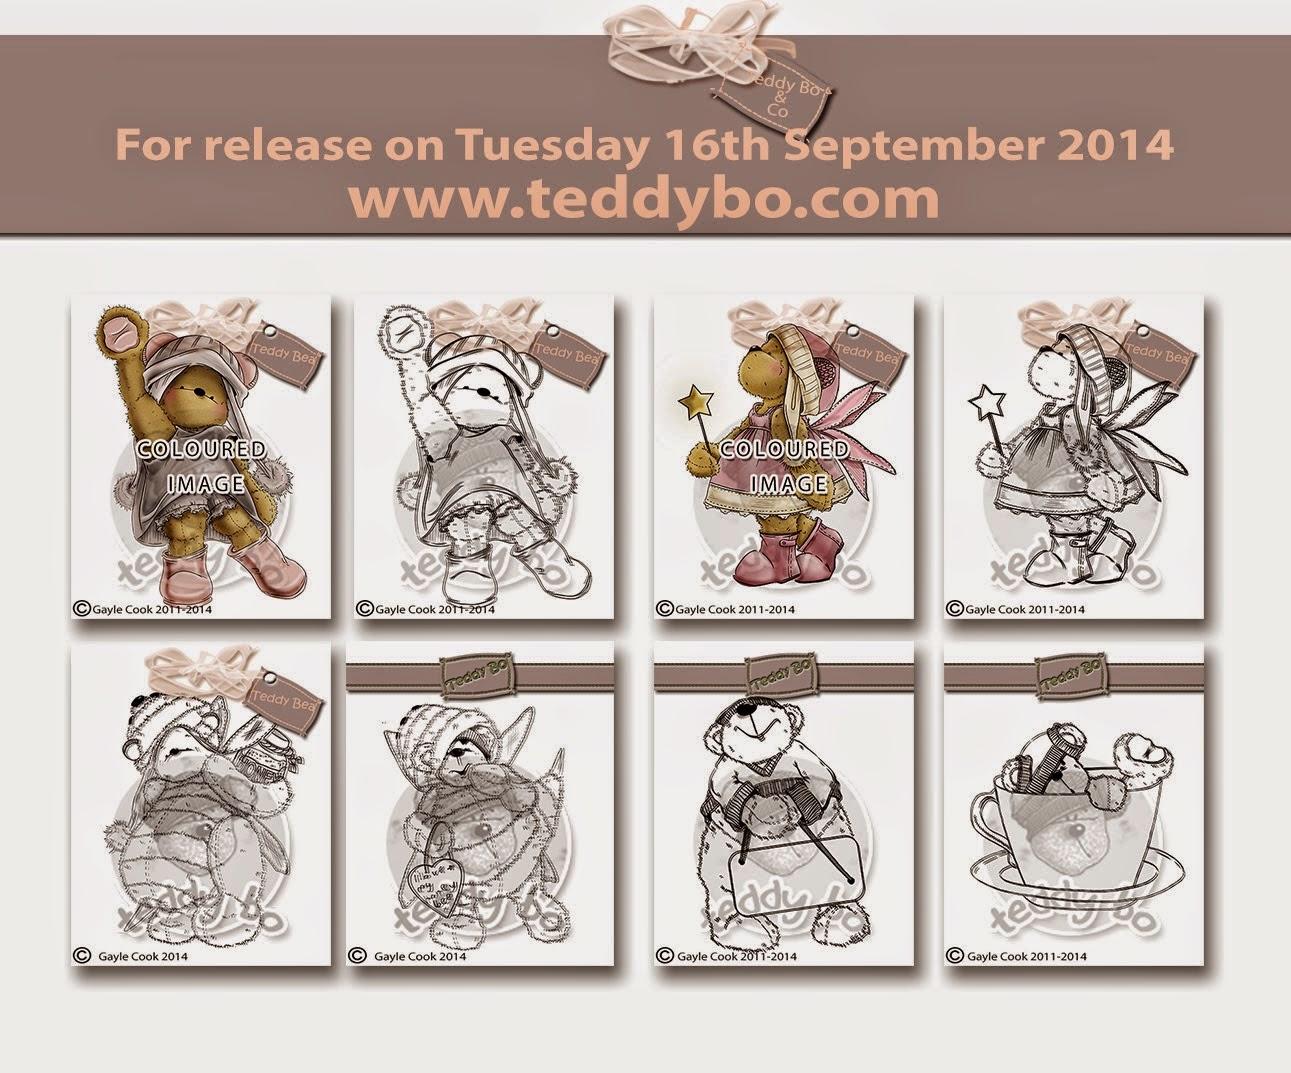 www.teddybo.com